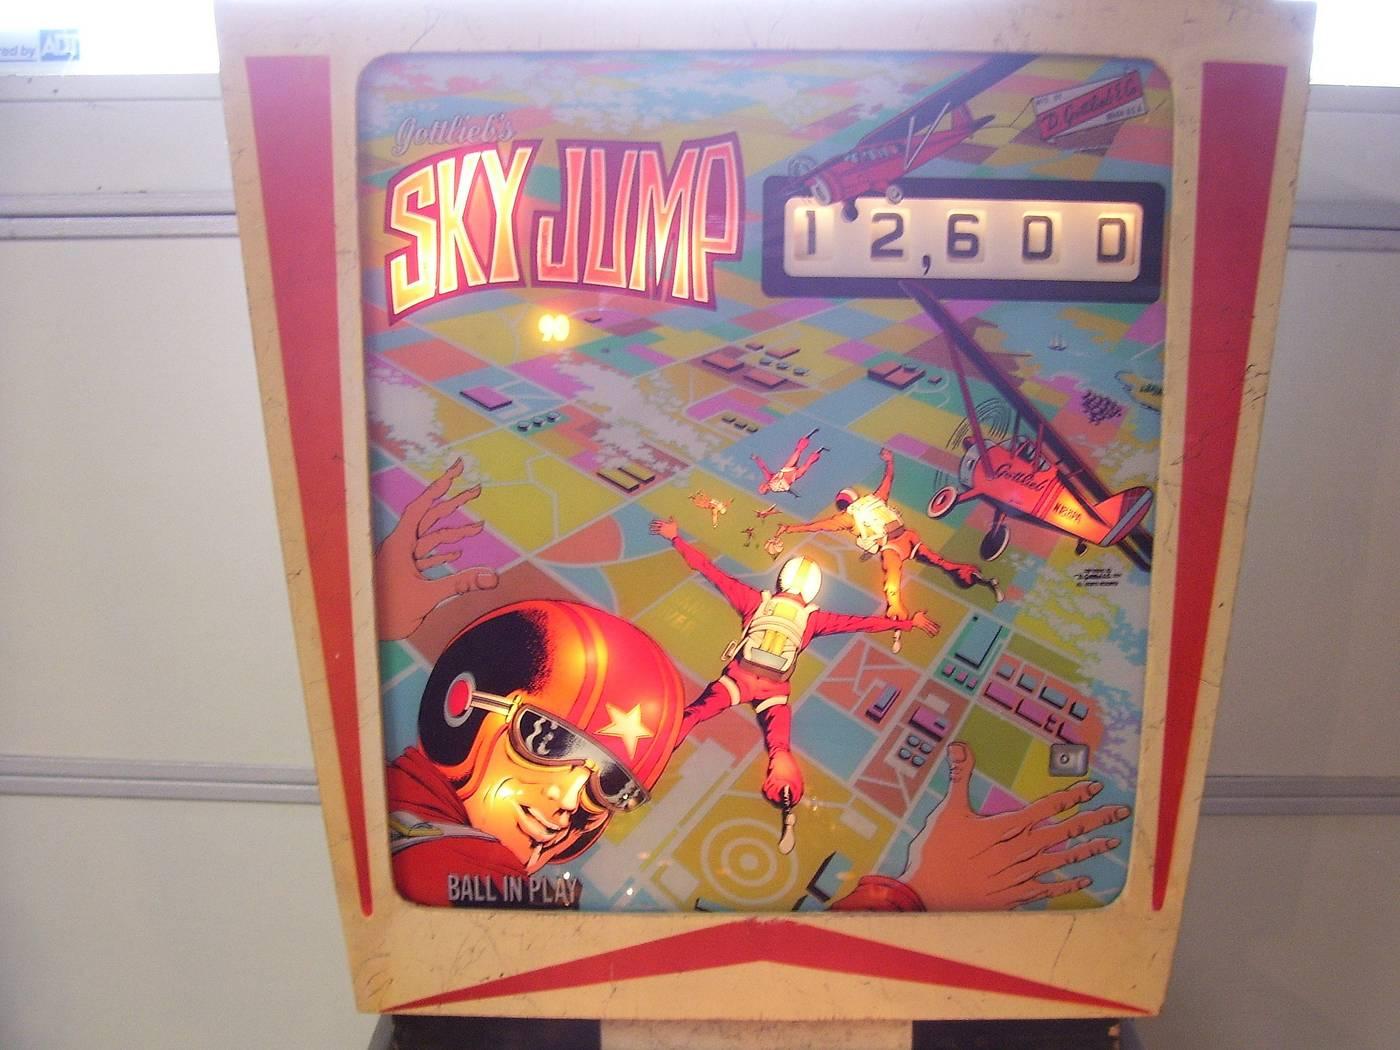 For Sale Sky Jump For Sale Pinside Market